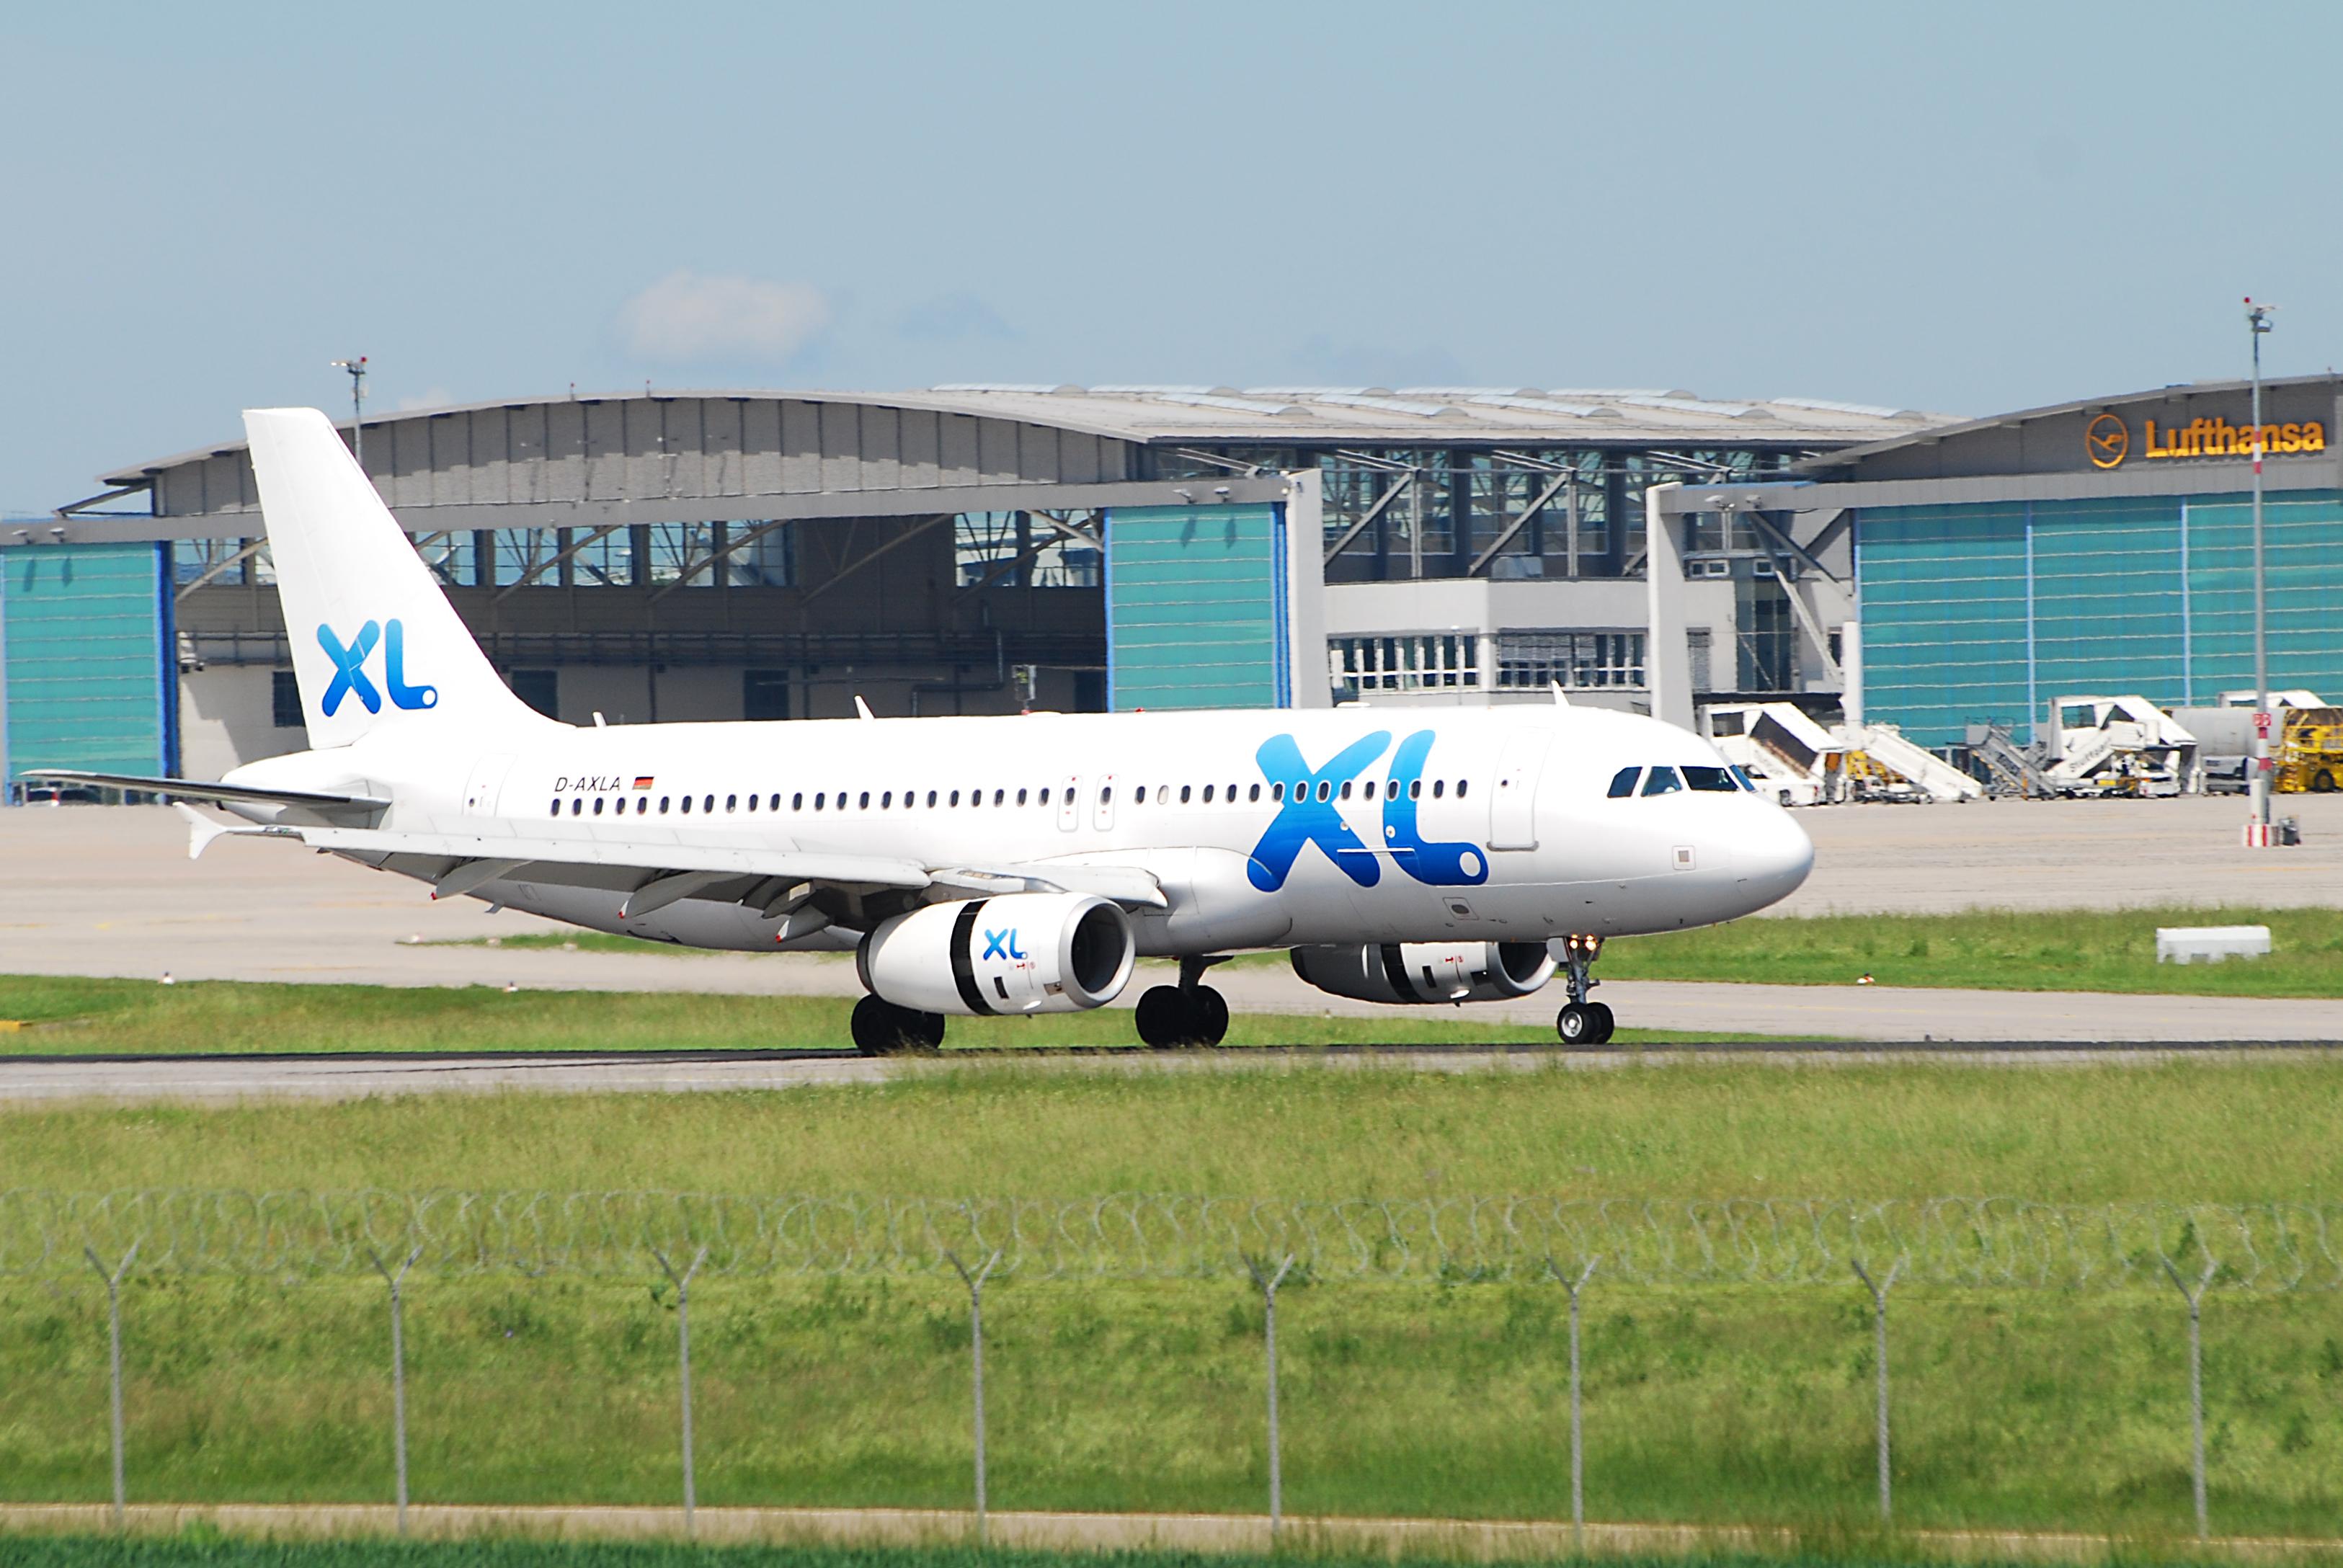 XL Airways Germany Flight 888T - Wikipedia